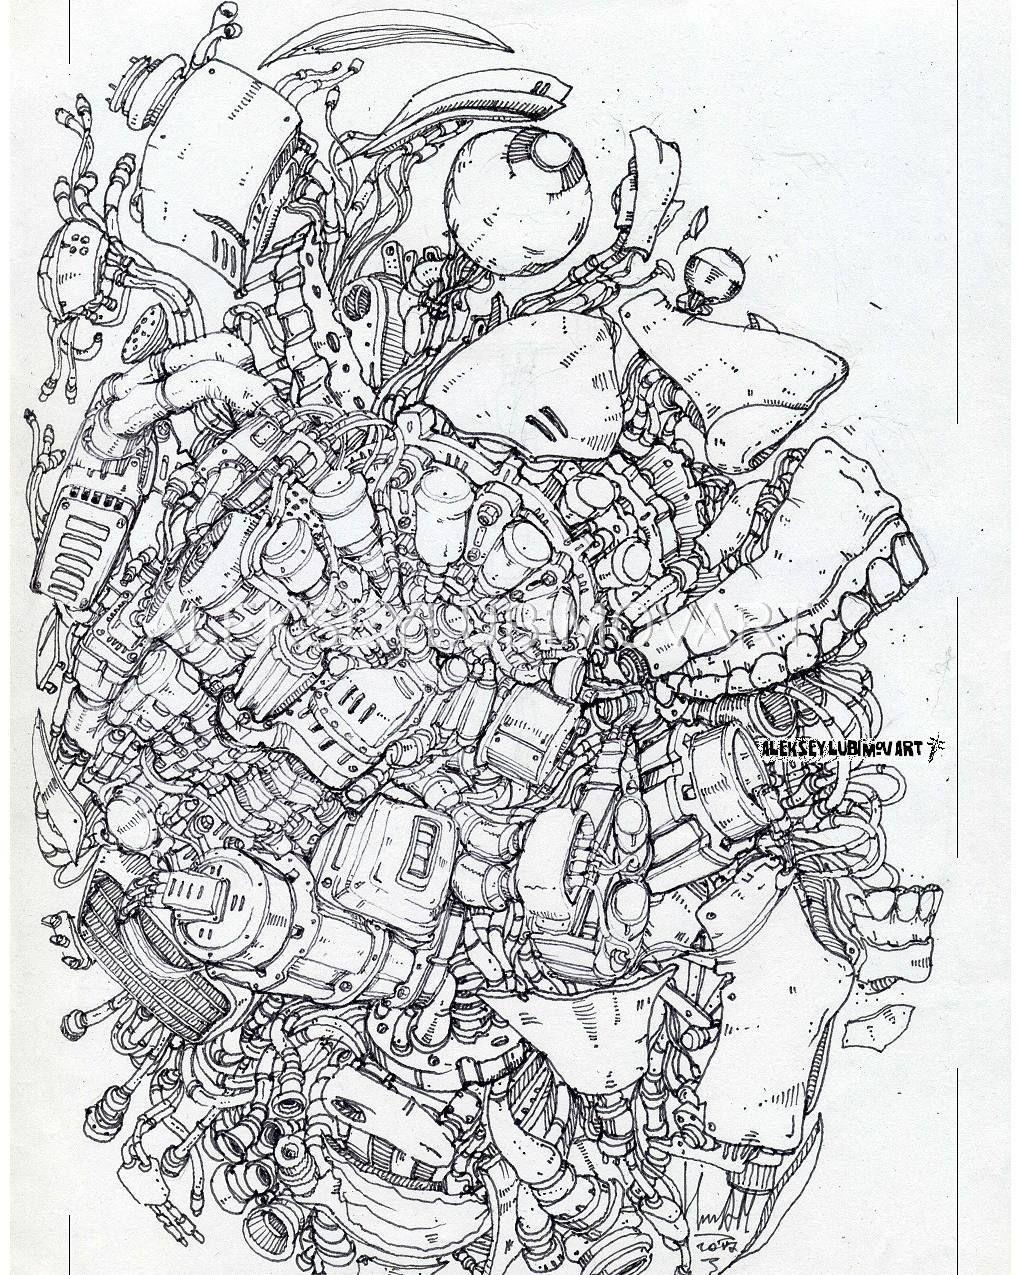 Author Aleksey Lubimov/Robot #алексейлюбимовбиомеханика #алексейлюбимов #стимпанк #дизельпанк #биомеханика #marchofrobots #steampunk #dieselpunk #alekseylubimov_art #biomechanical #lineart